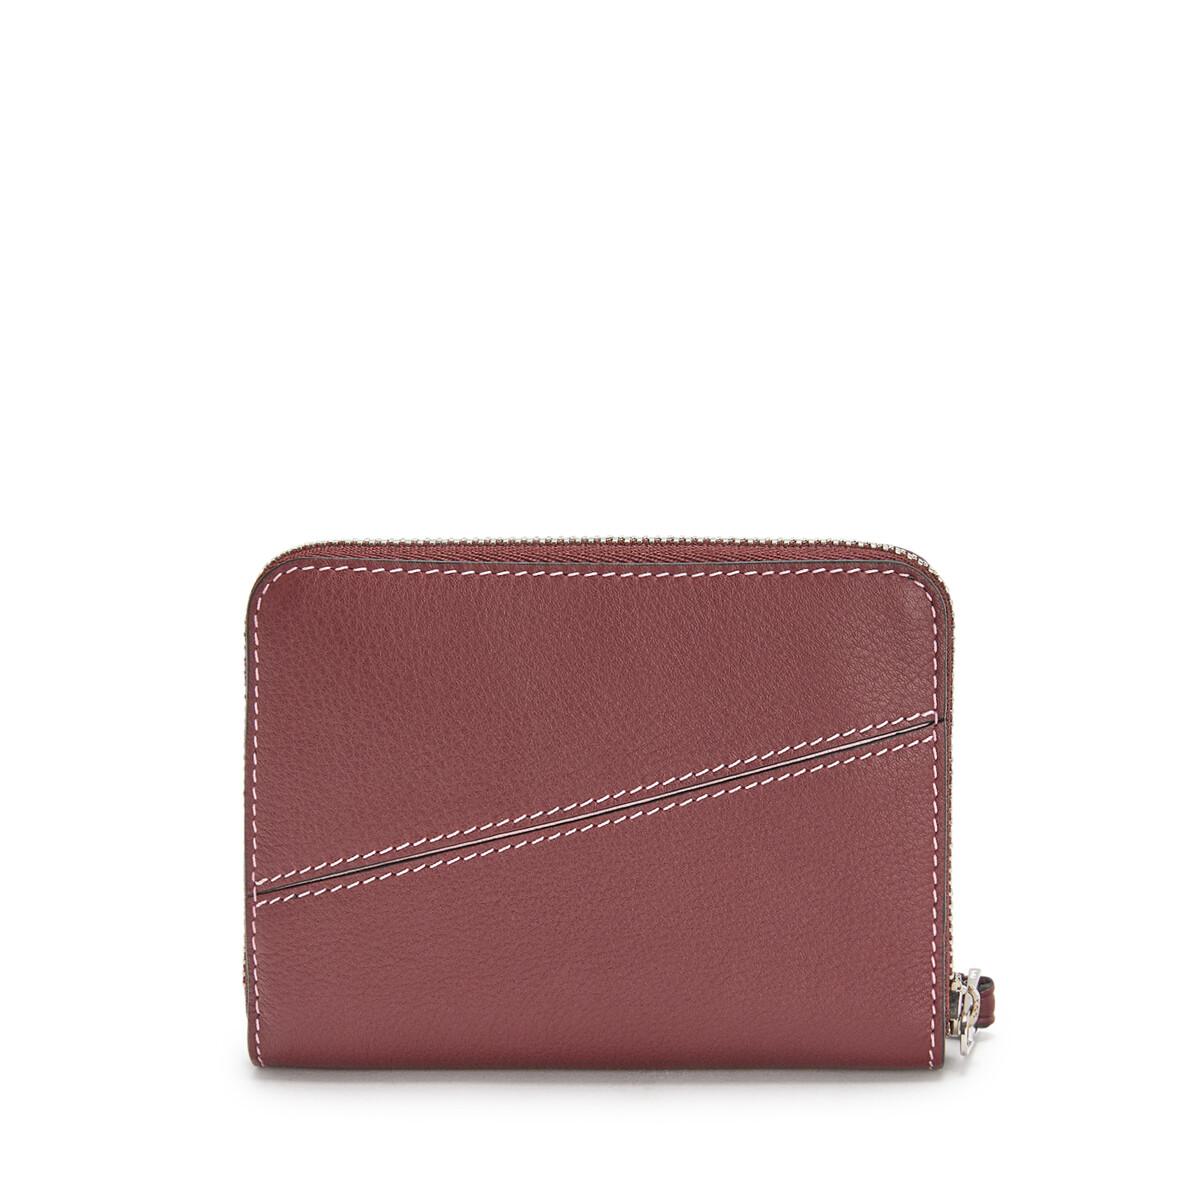 LOEWE Puzzle 6 Card Zip Wallet Wine/Pastel Pink front